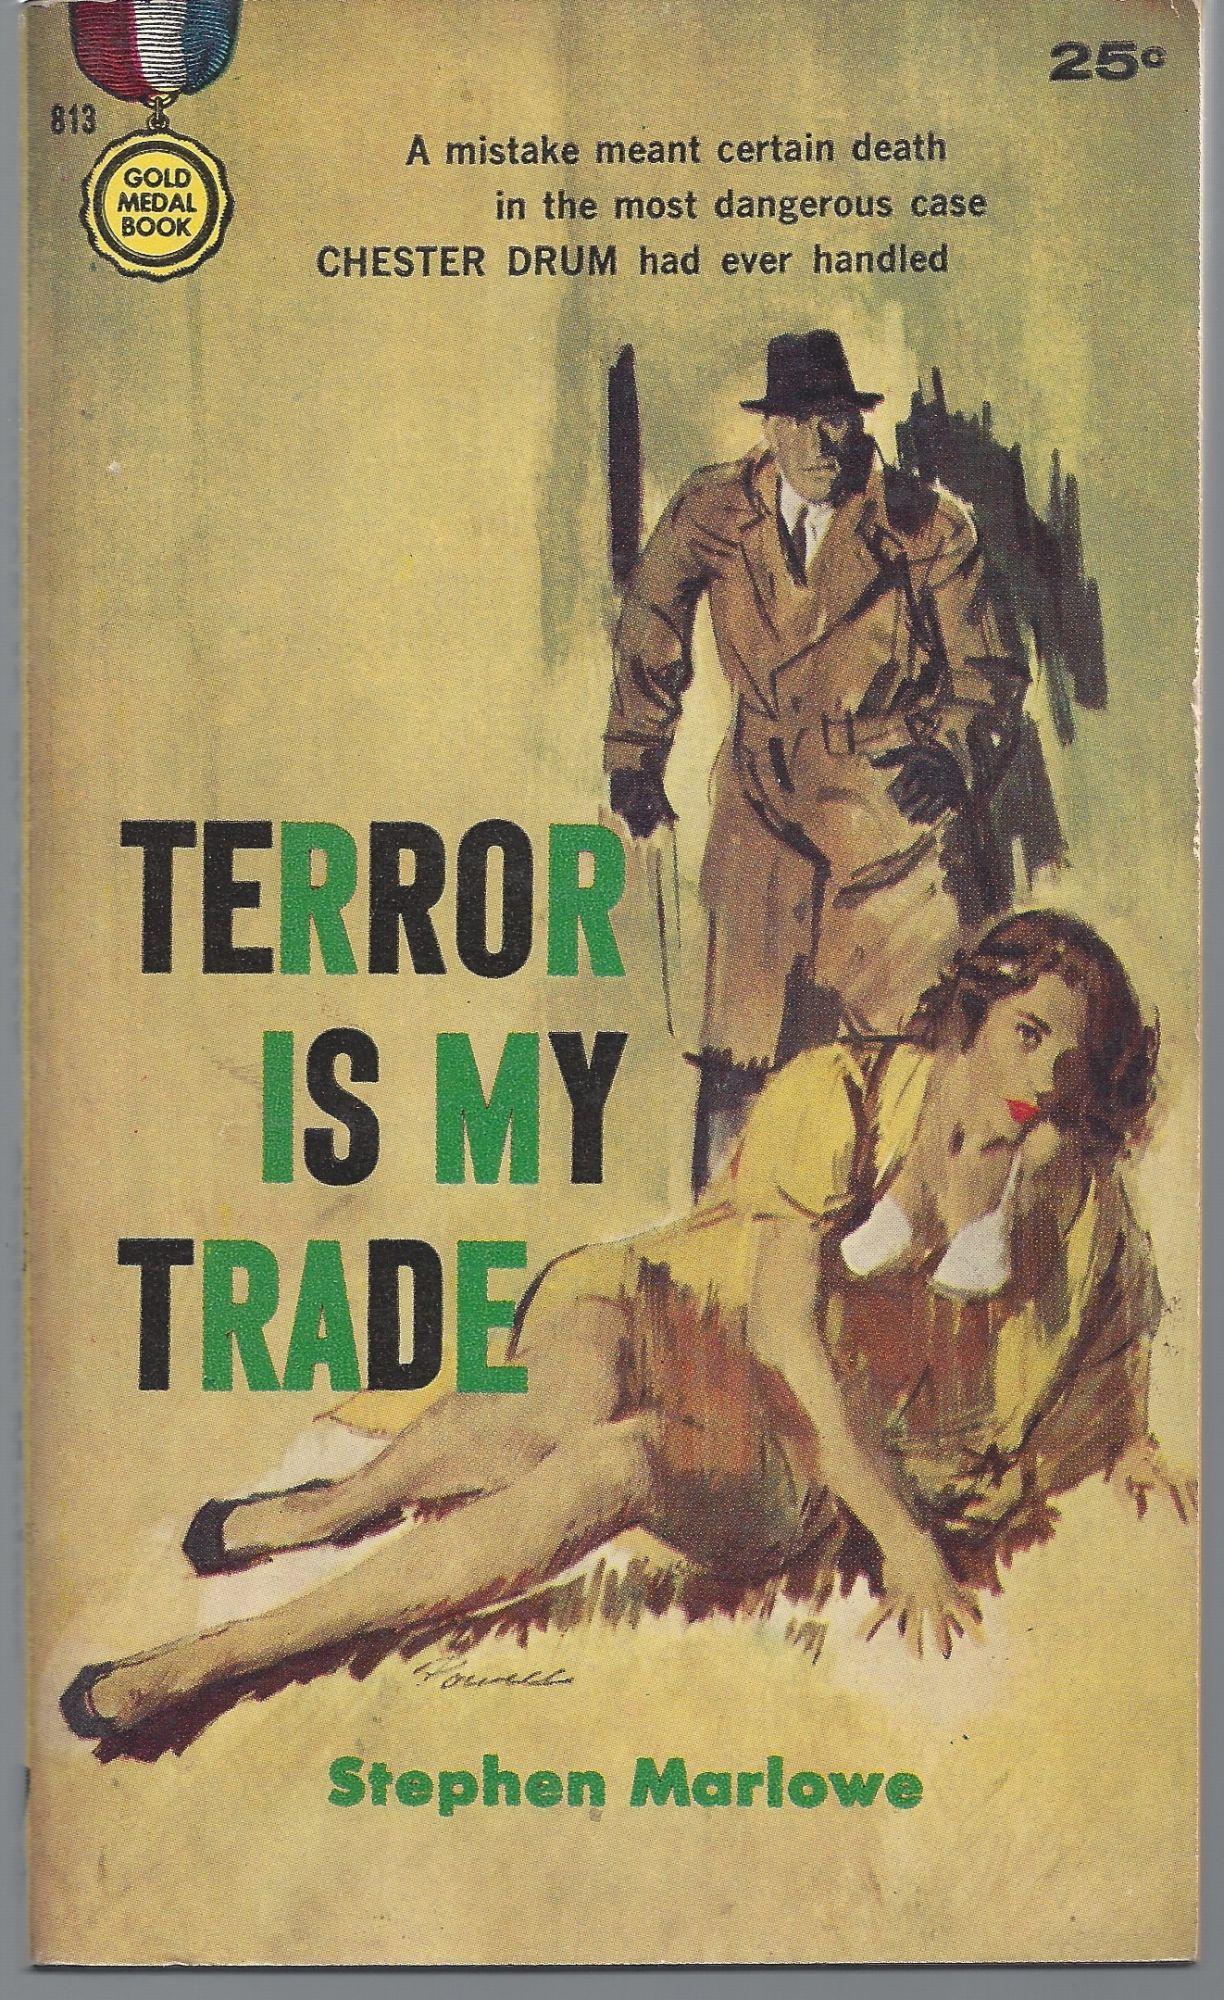 Stephen Marlowe / Terror is My Trade First Edition 1958 | eBay